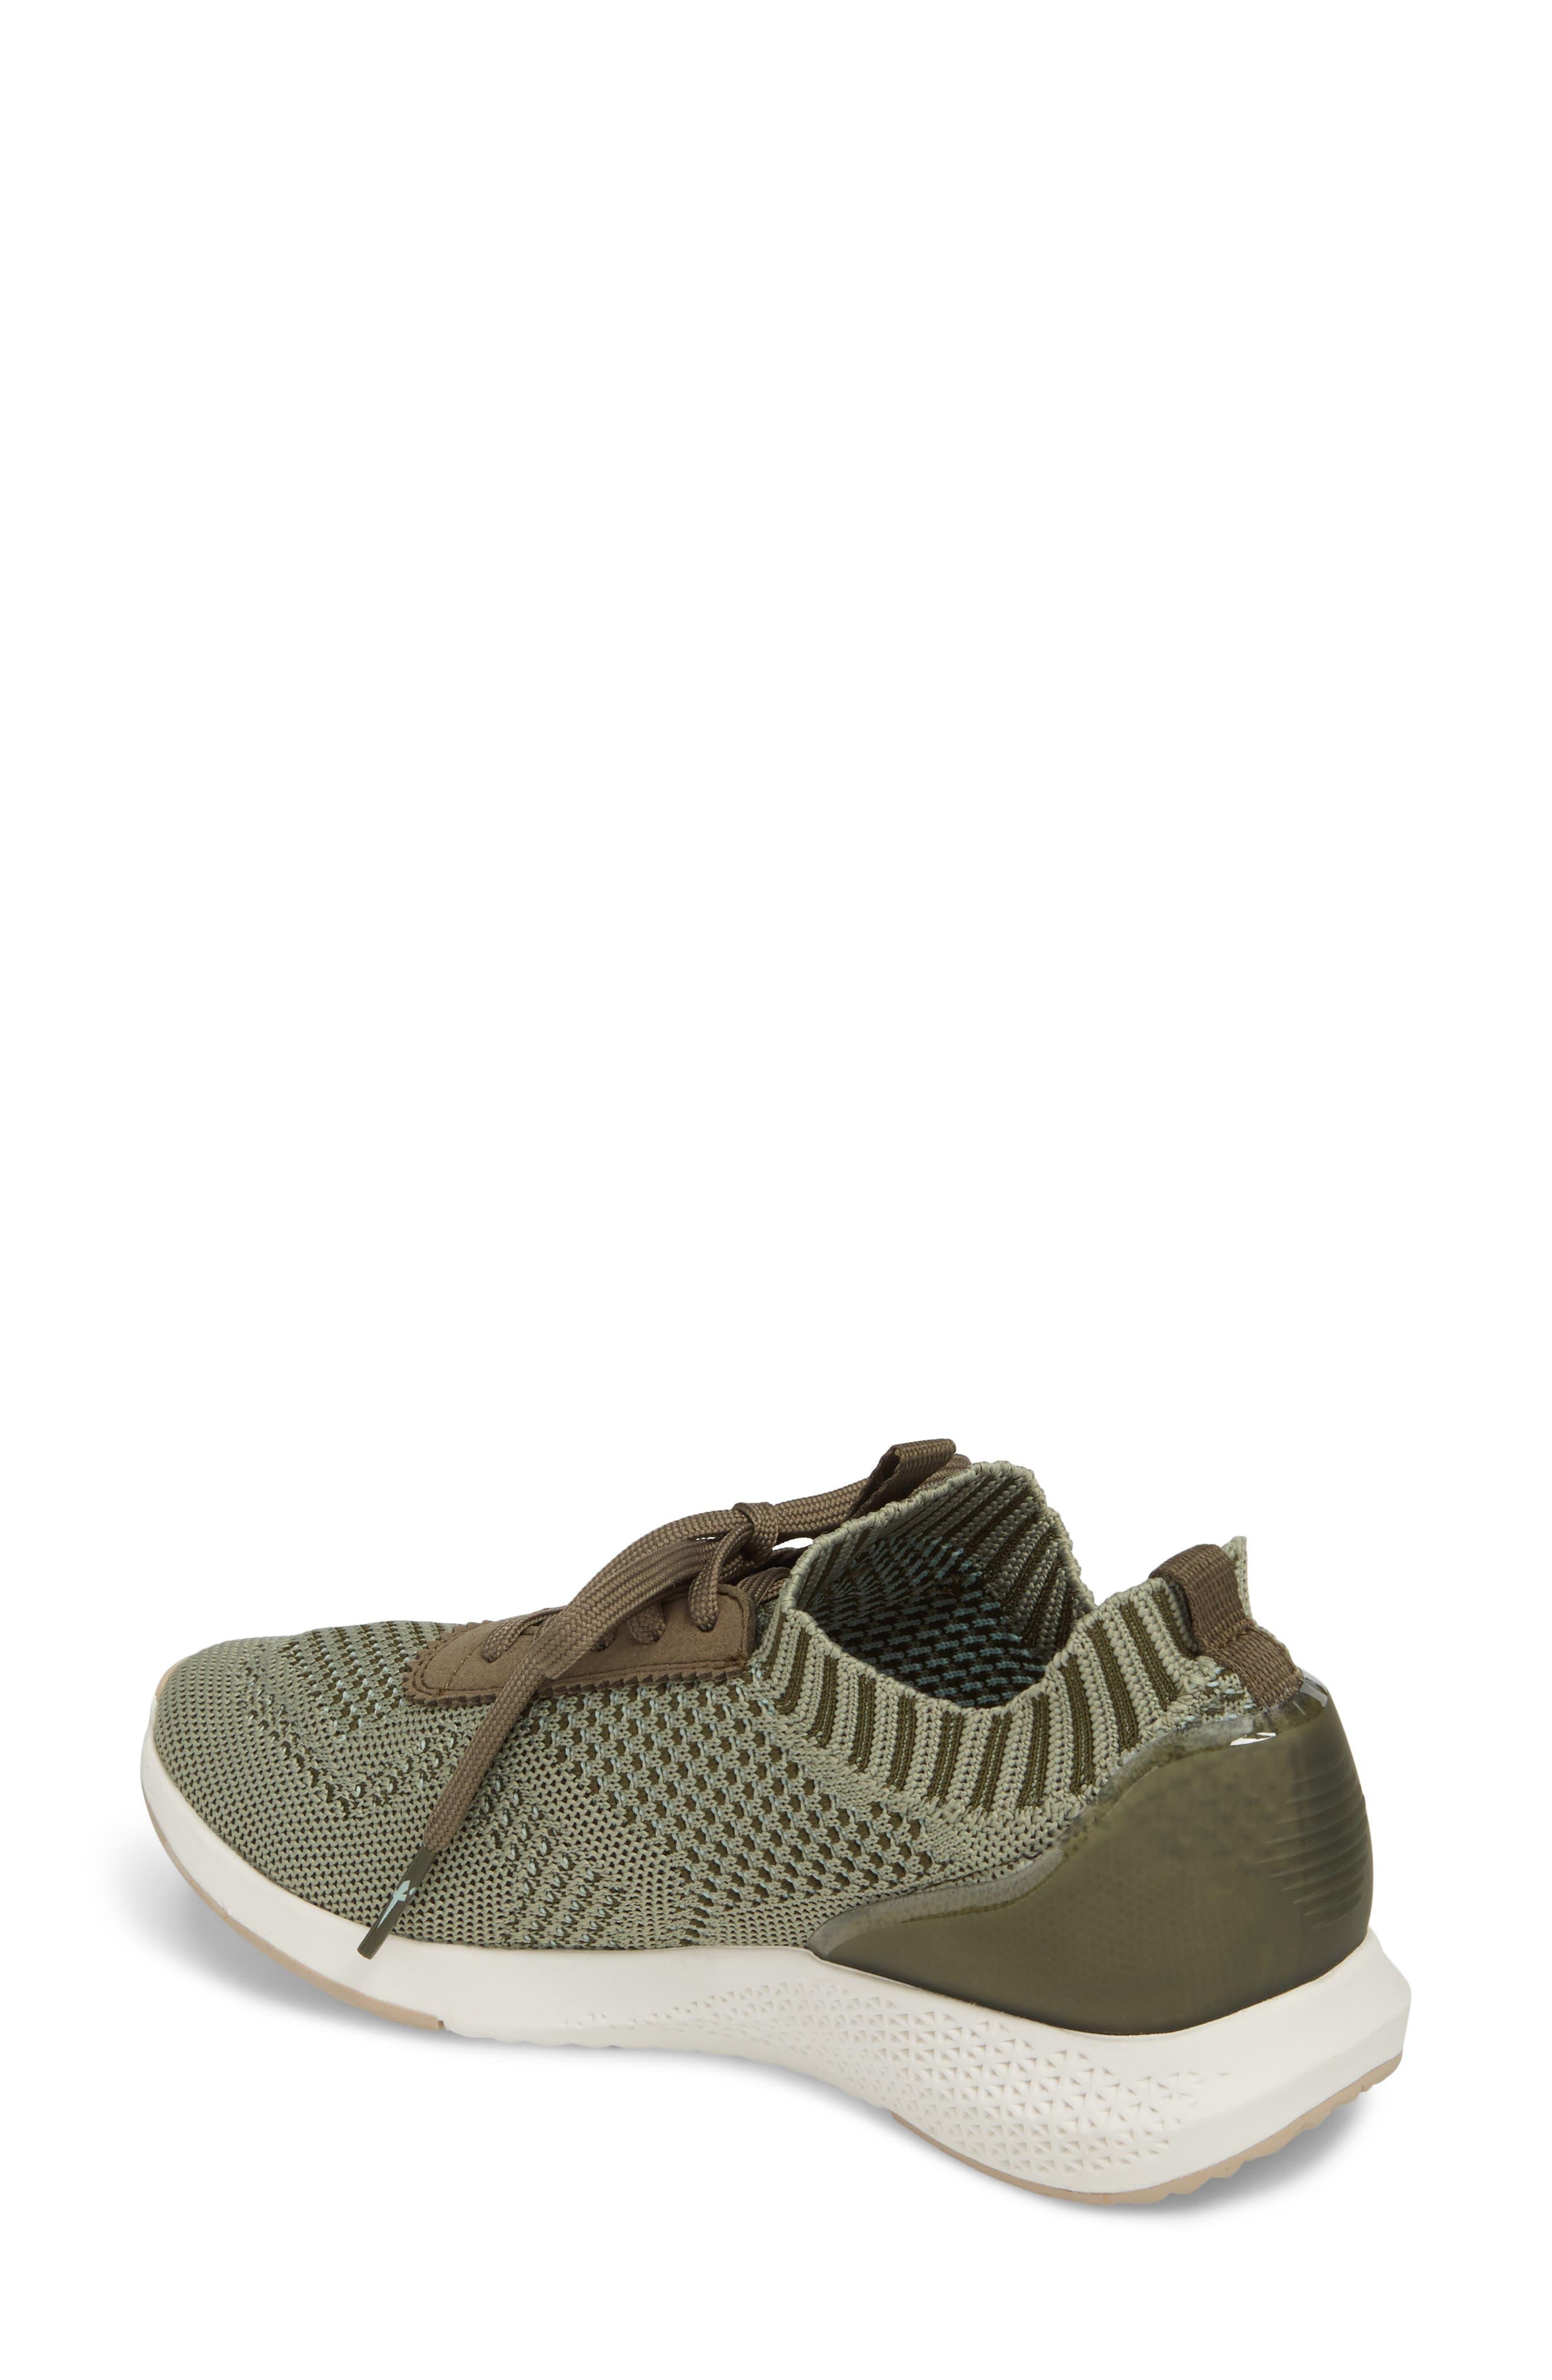 Tavia Sneaker,                             Alternate thumbnail 3, color,